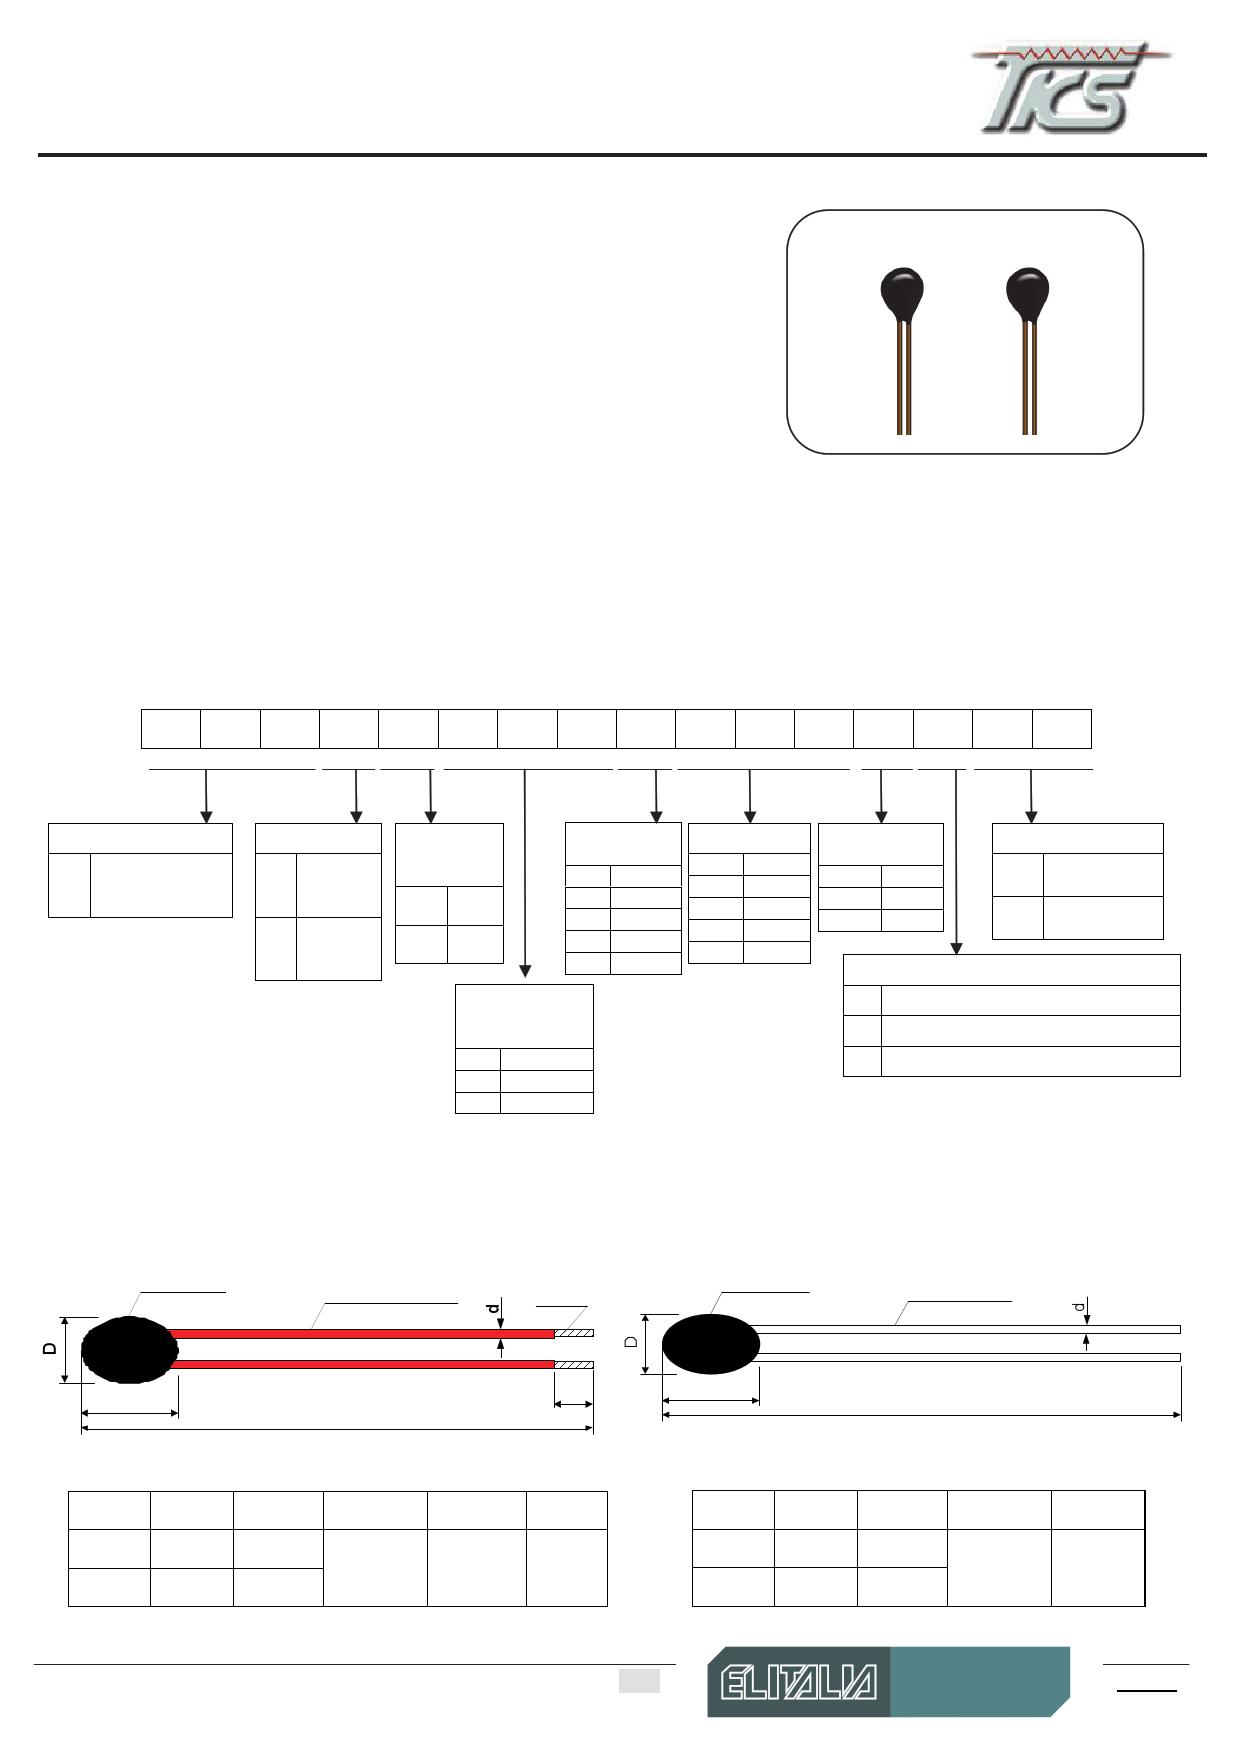 TTS2B474 datasheet, circuit